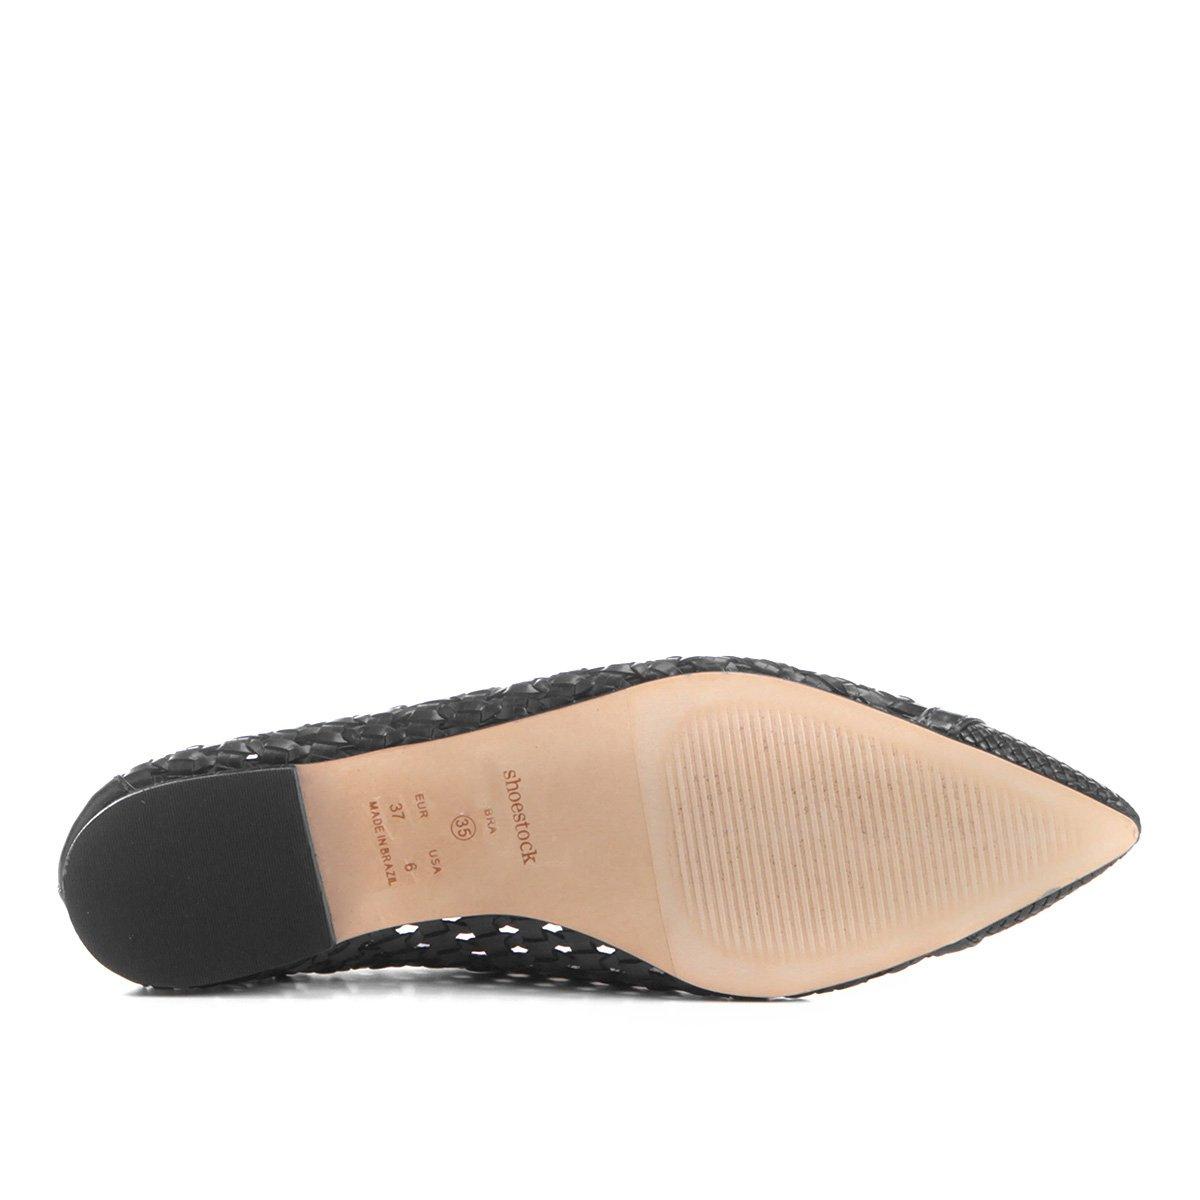 Shoestock Sapatilha Sapatilha Shoestock Feminina Sapatilha Tressê Fino Bico Preto Feminina Preto Bico Tressê Fino XHq0x8nw